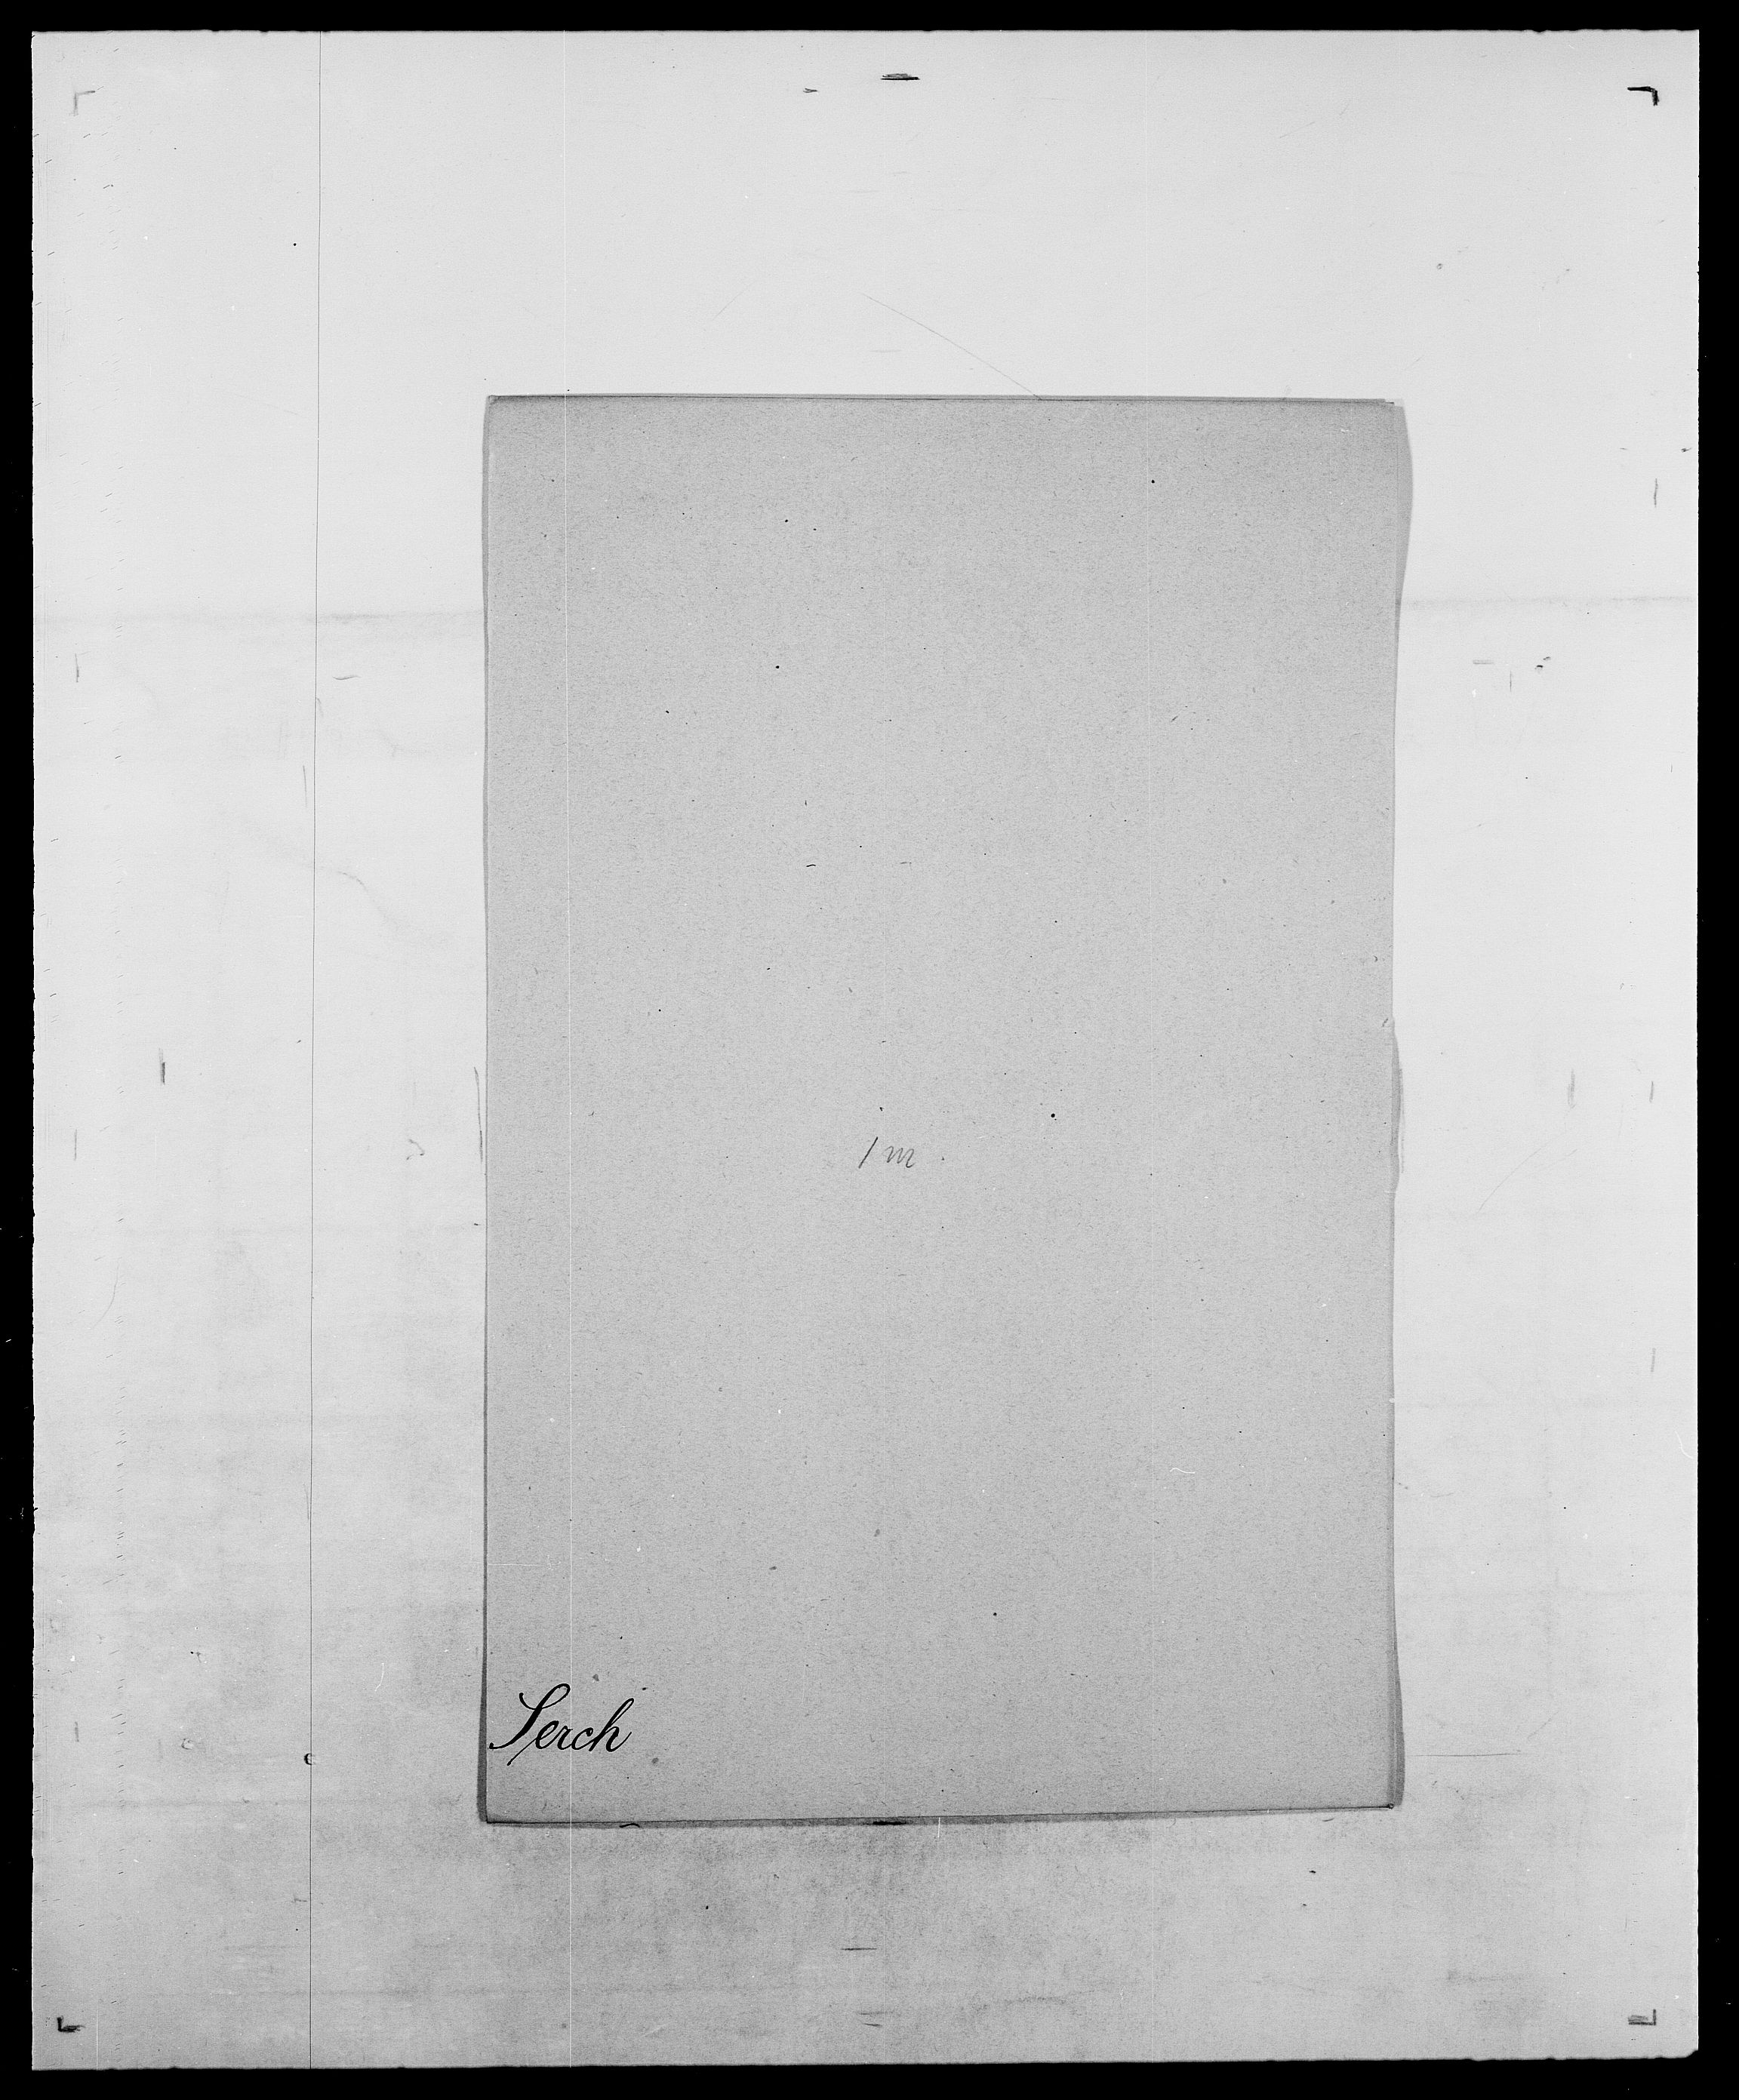 SAO, Delgobe, Charles Antoine - samling, D/Da/L0035: Schnabel - sjetman, s. 714